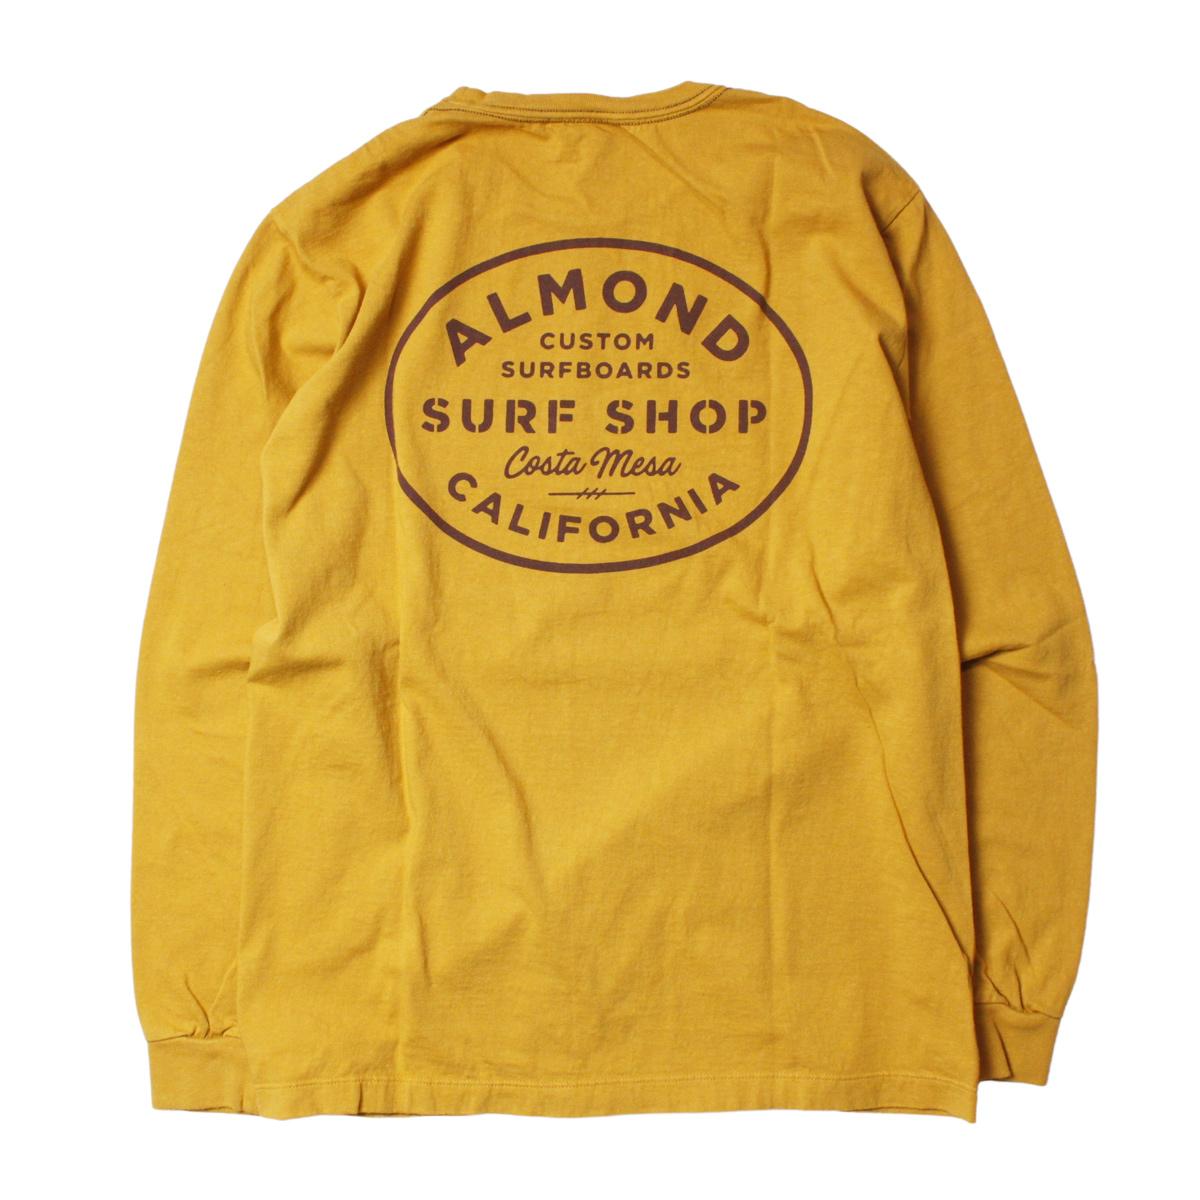 Almond Surf アーモンドサーフボードデザイン SURF SHOP L/S T-SHIRTS